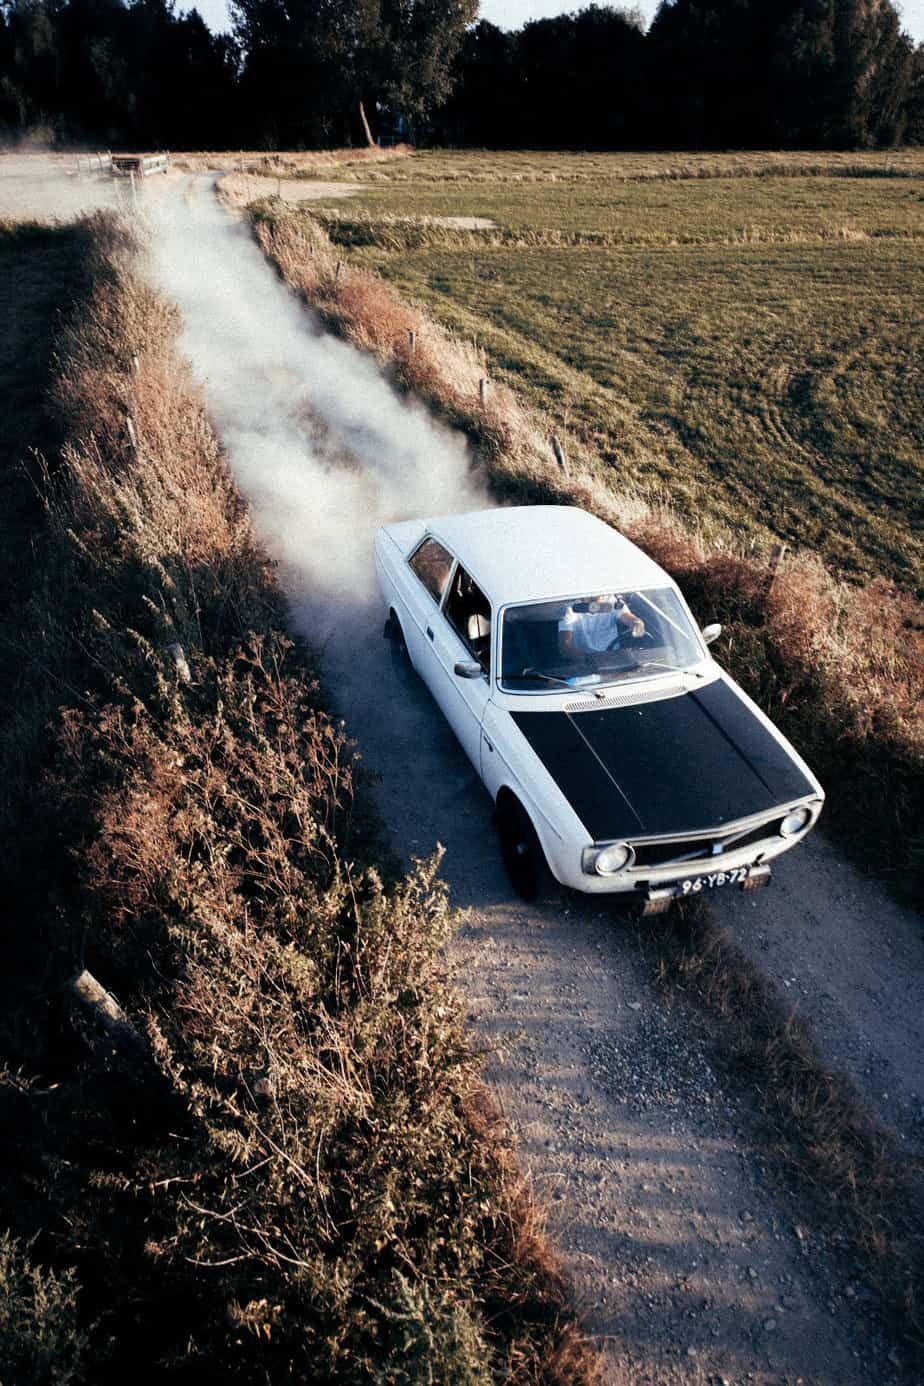 lowlands the netherlands janfillem volvo classic car